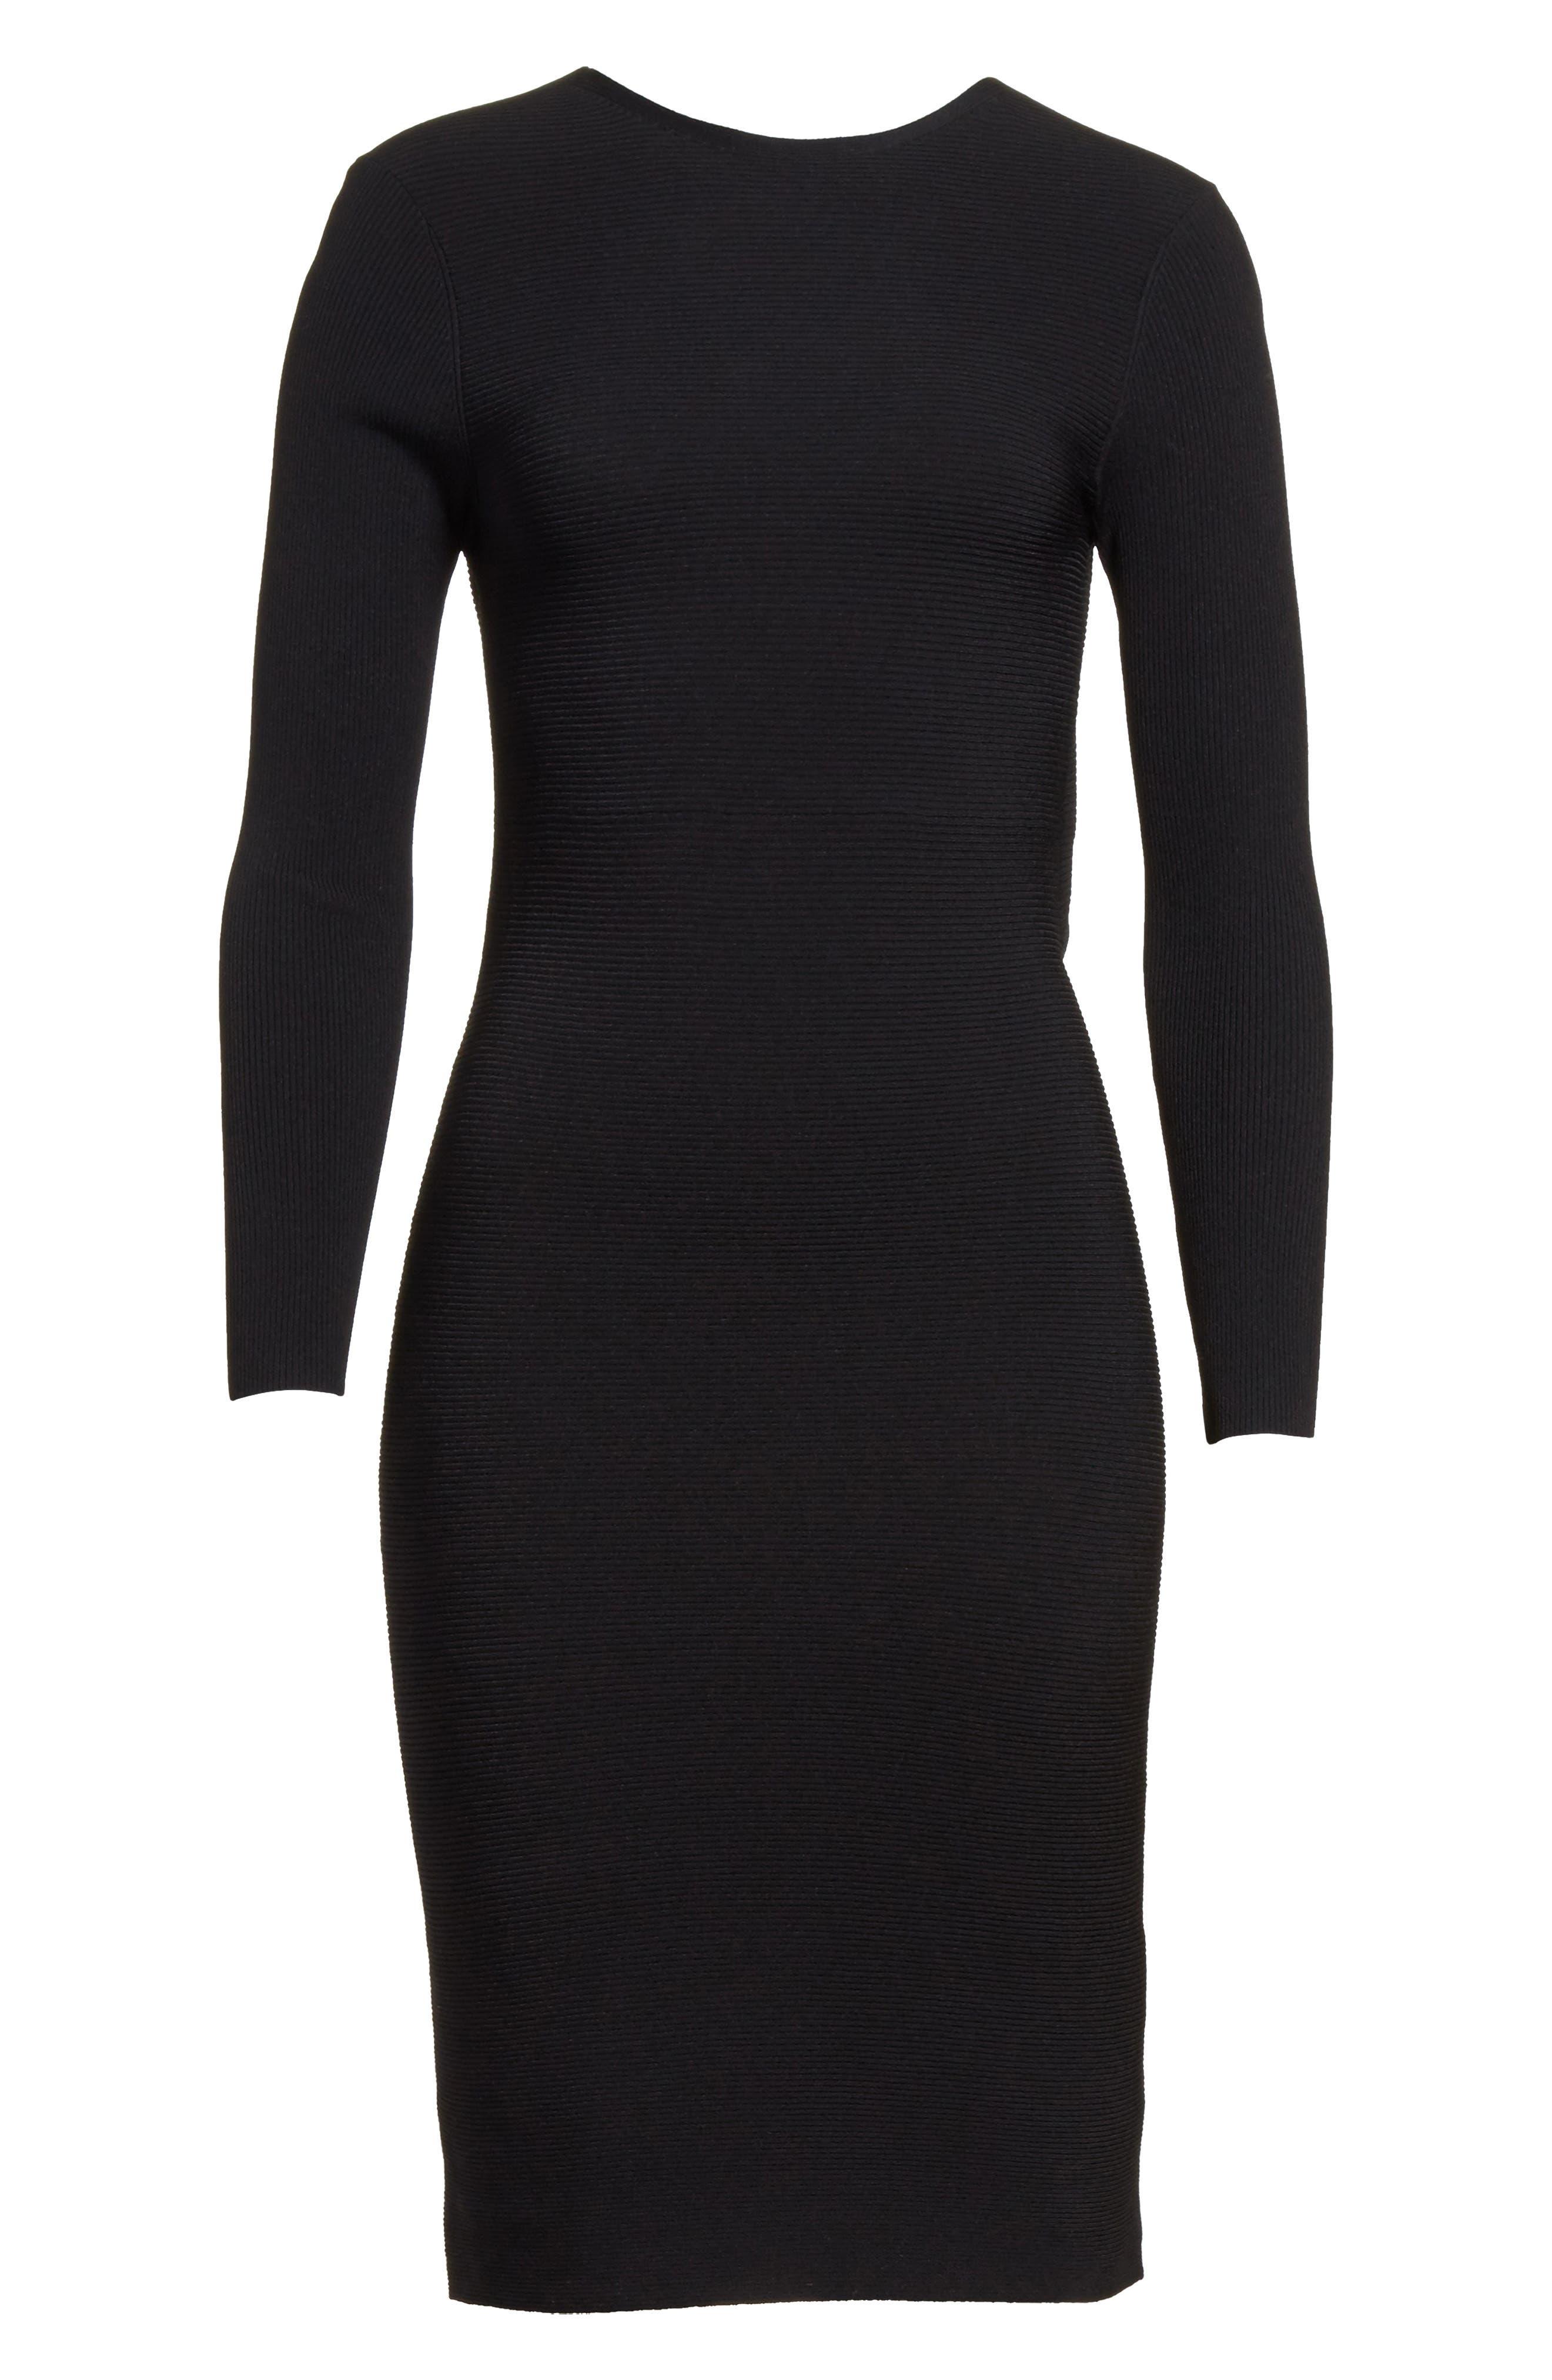 Technical Rib Open Back Dress,                             Alternate thumbnail 6, color,                             Black